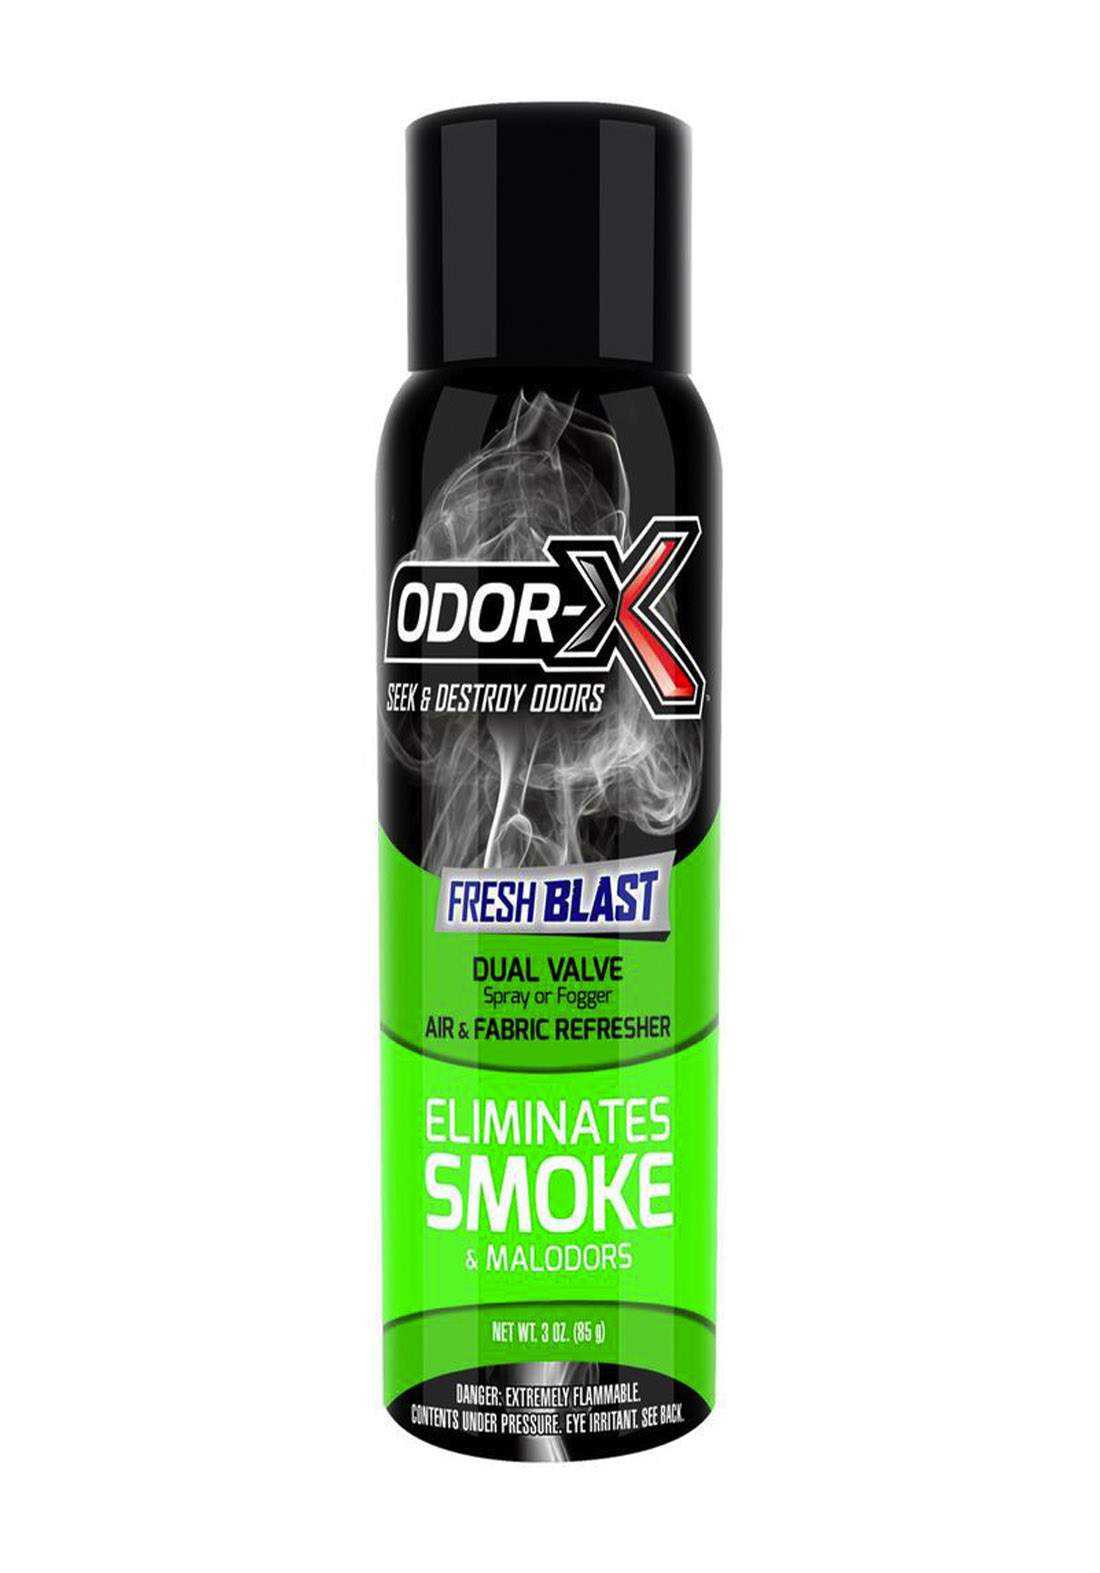 Turtle Wax Smoke Eliminator Spray 85 g بخاخ مزيل رائحة الدخان